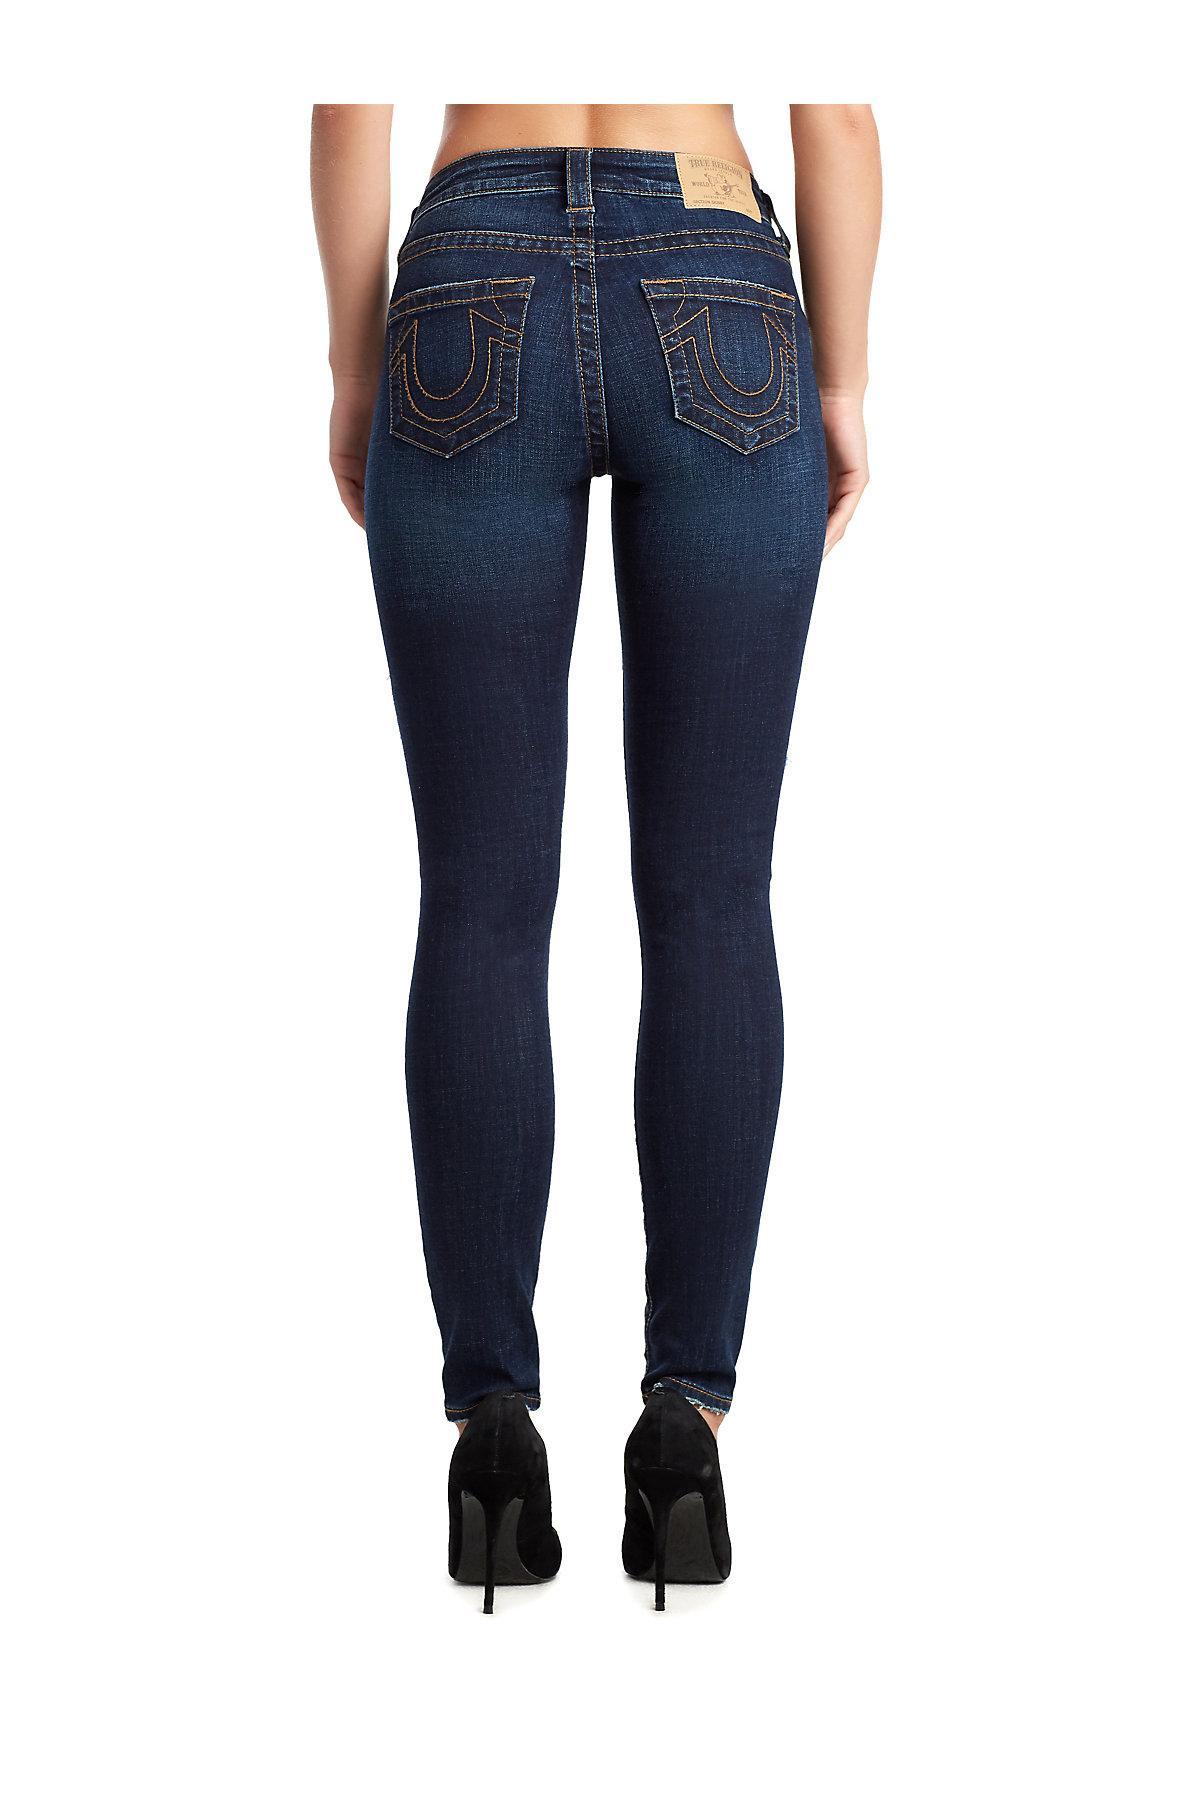 237be4d0a5 Lyst - True Religion Jennie Curvy Skinny Jean in Blue